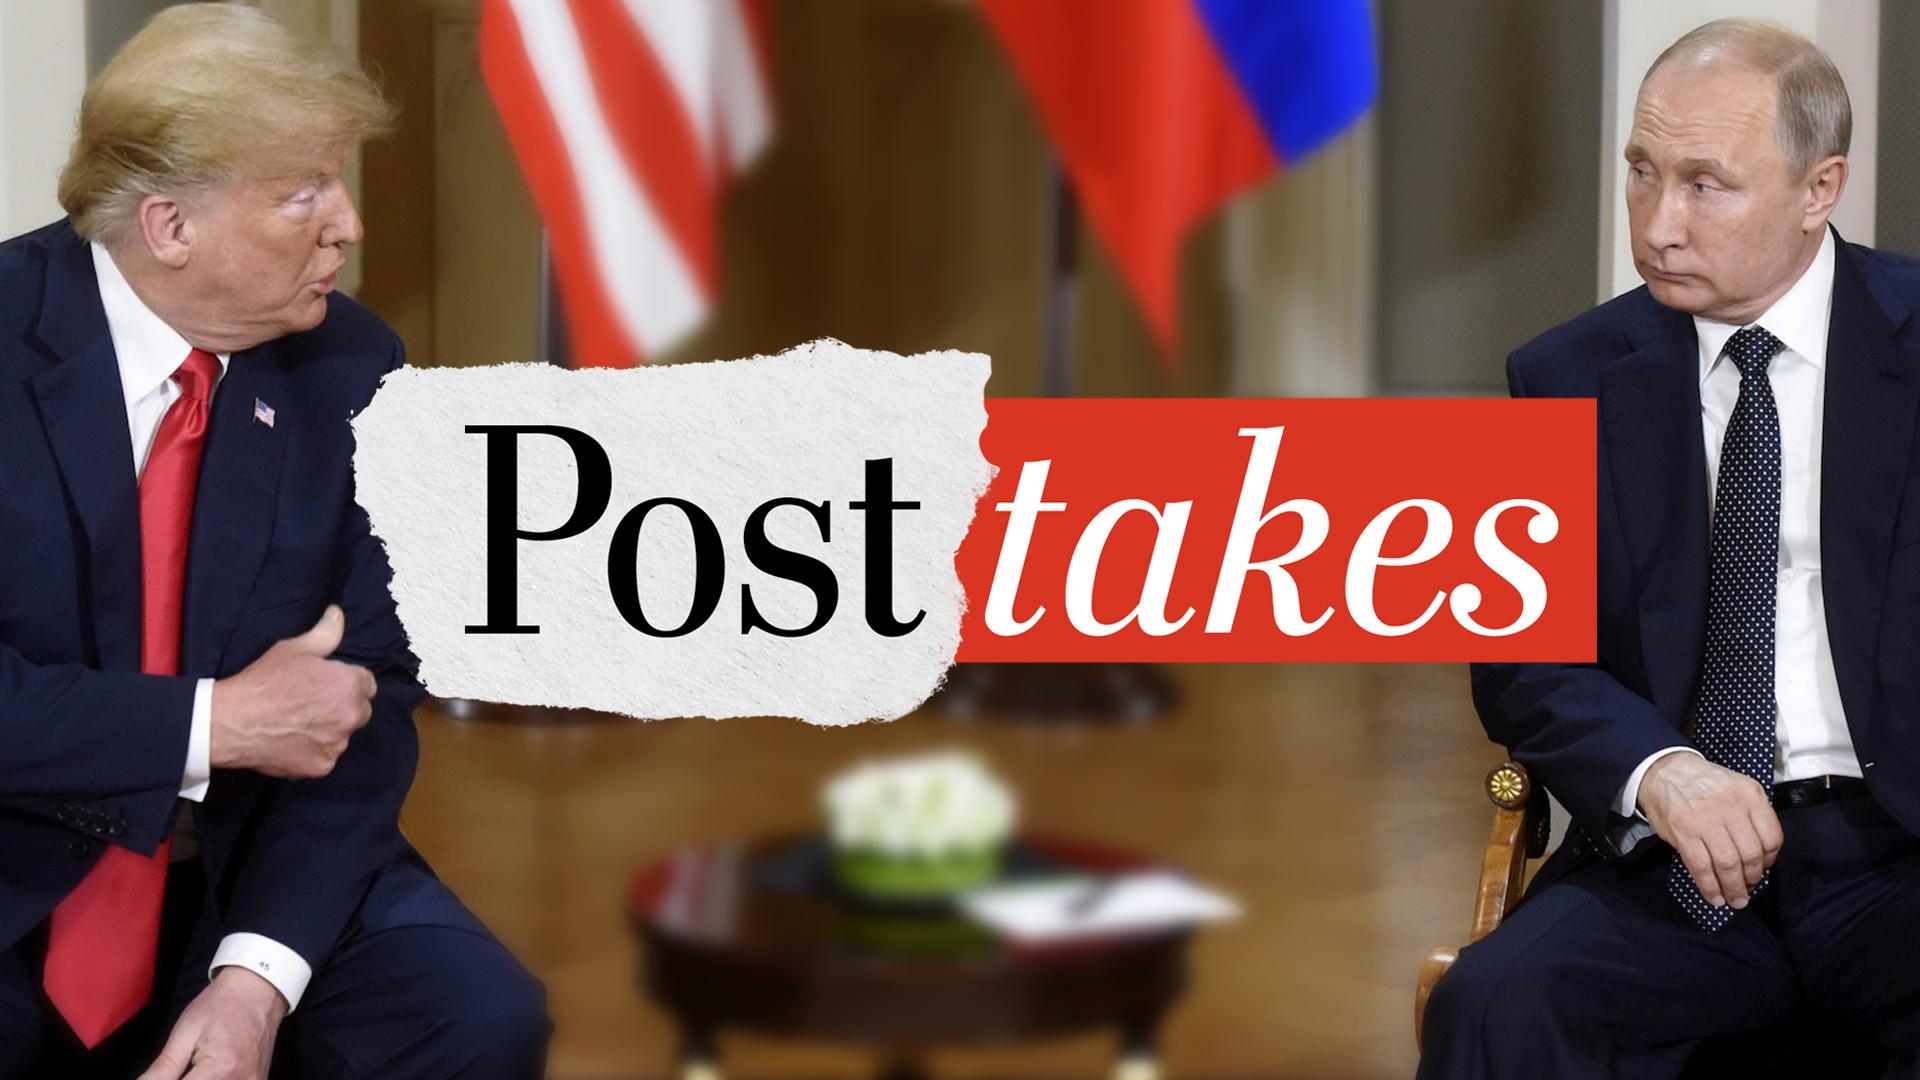 As explosive new Russia revelations hit Trump, Republicans throw him a lifeline